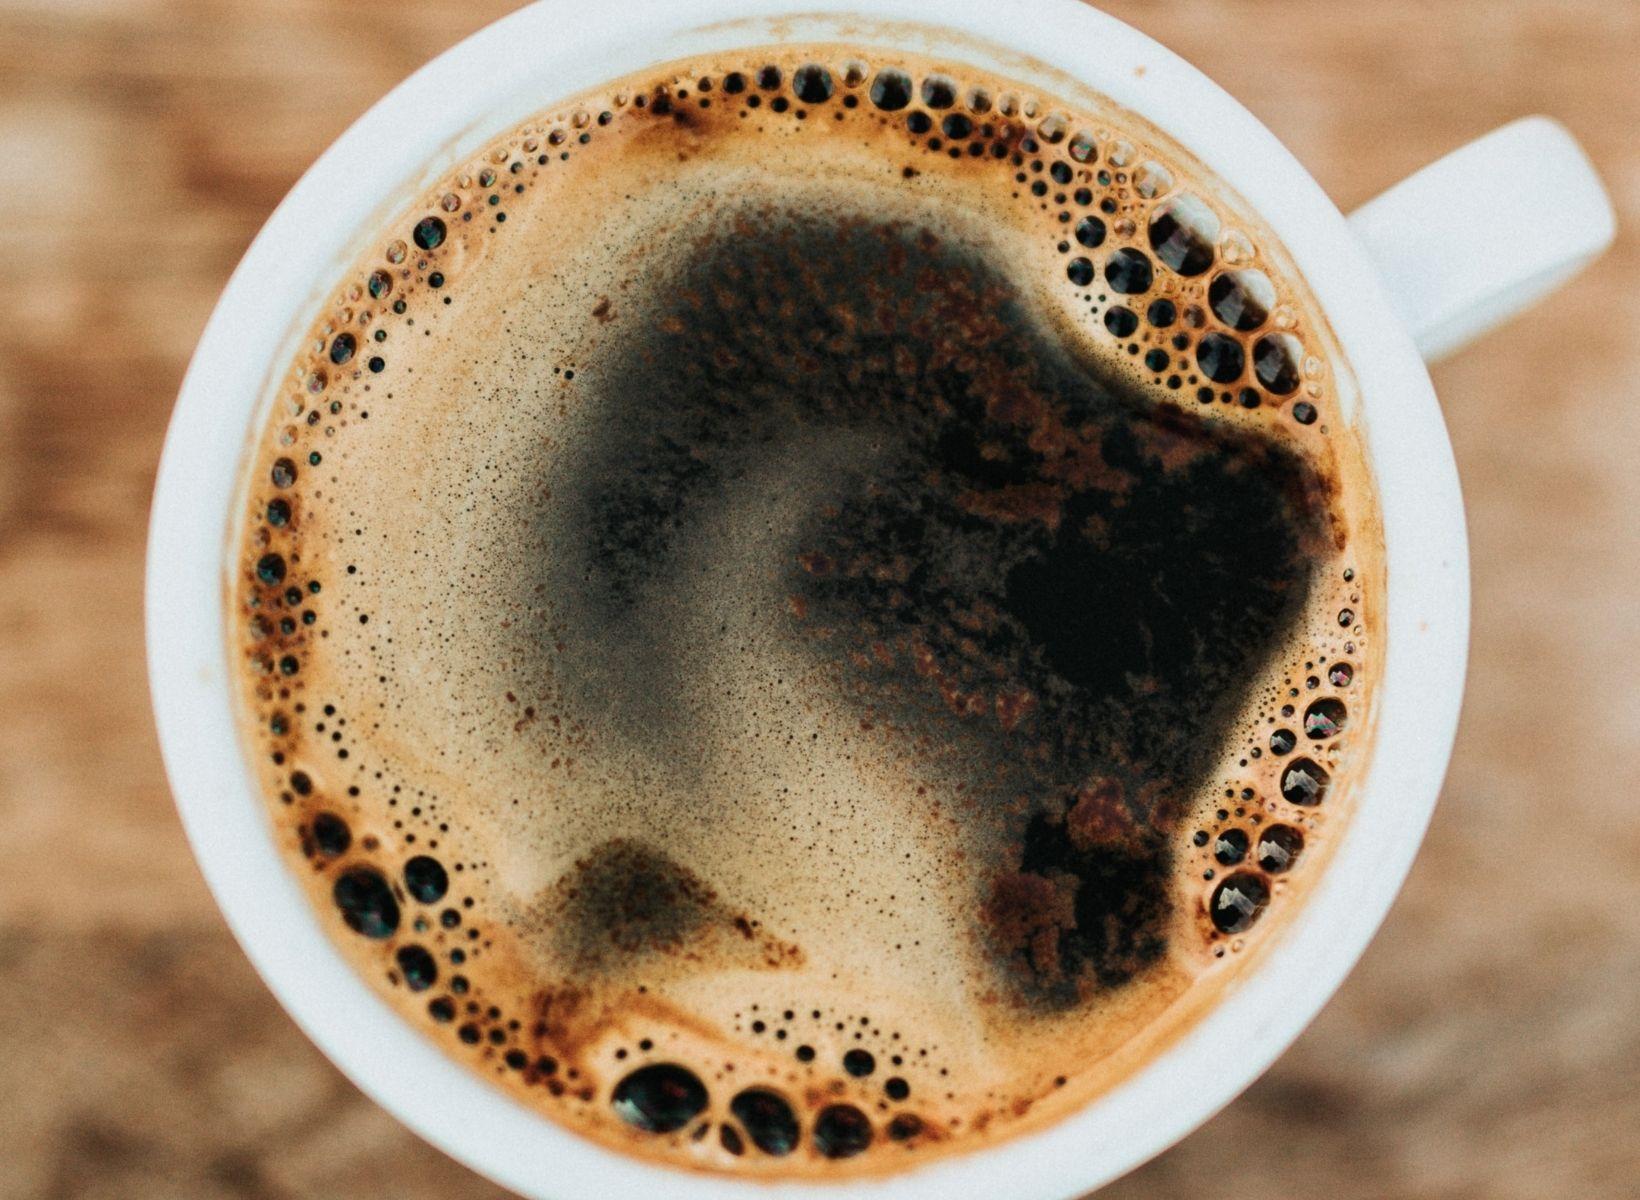 A close up overhead shot of a white mug with black coffee